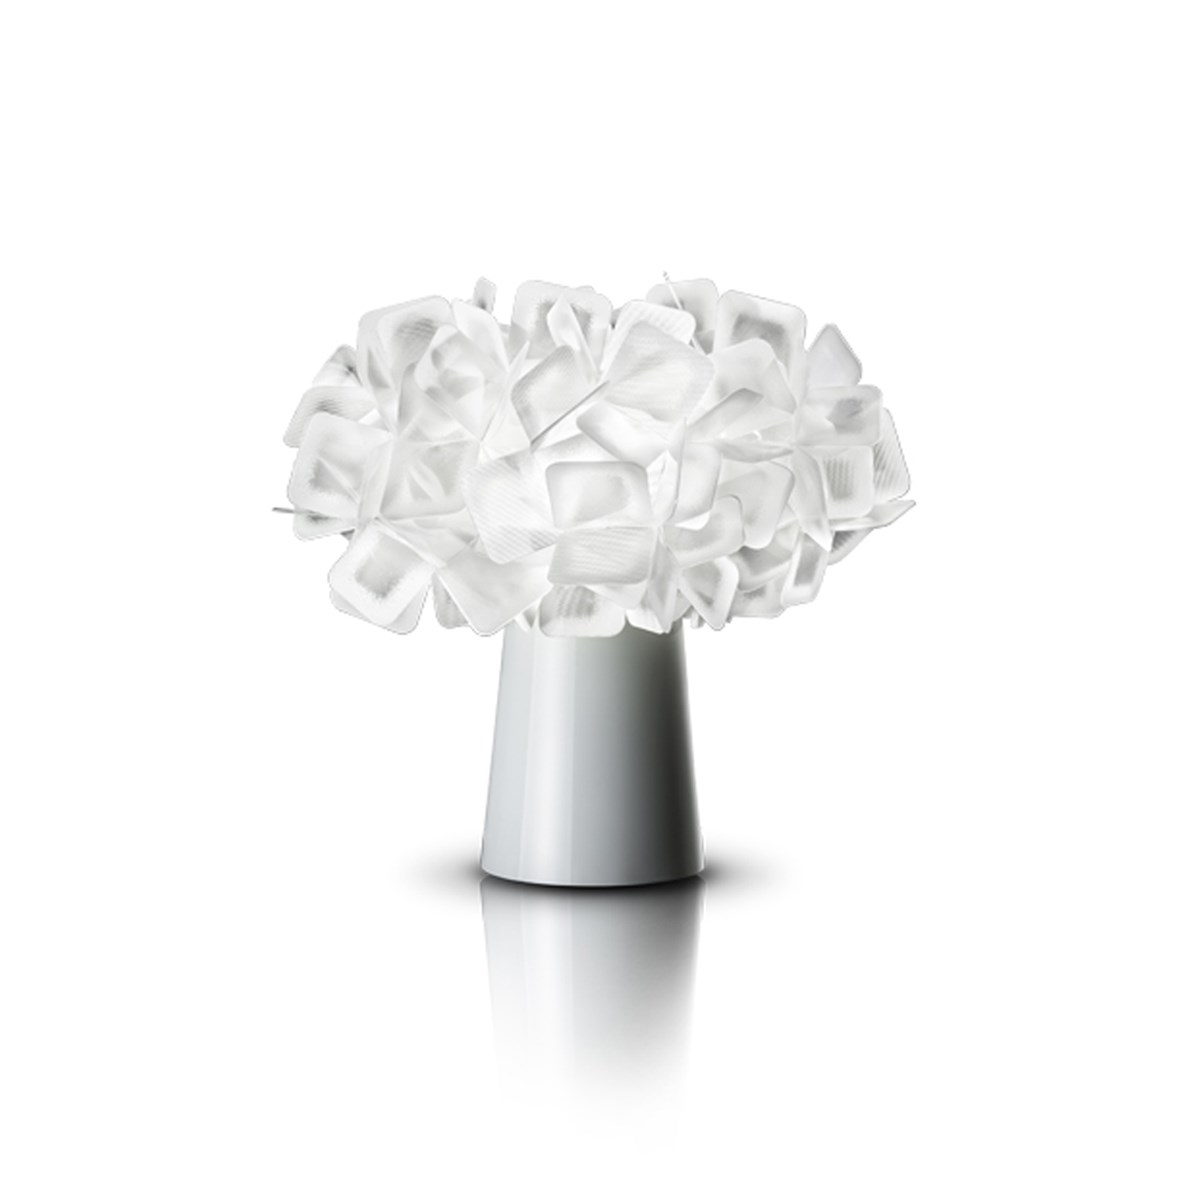 Slamp-Adriano-Rachele-Clizia-Table-Lamp-Battery-Powered-Matisse-1